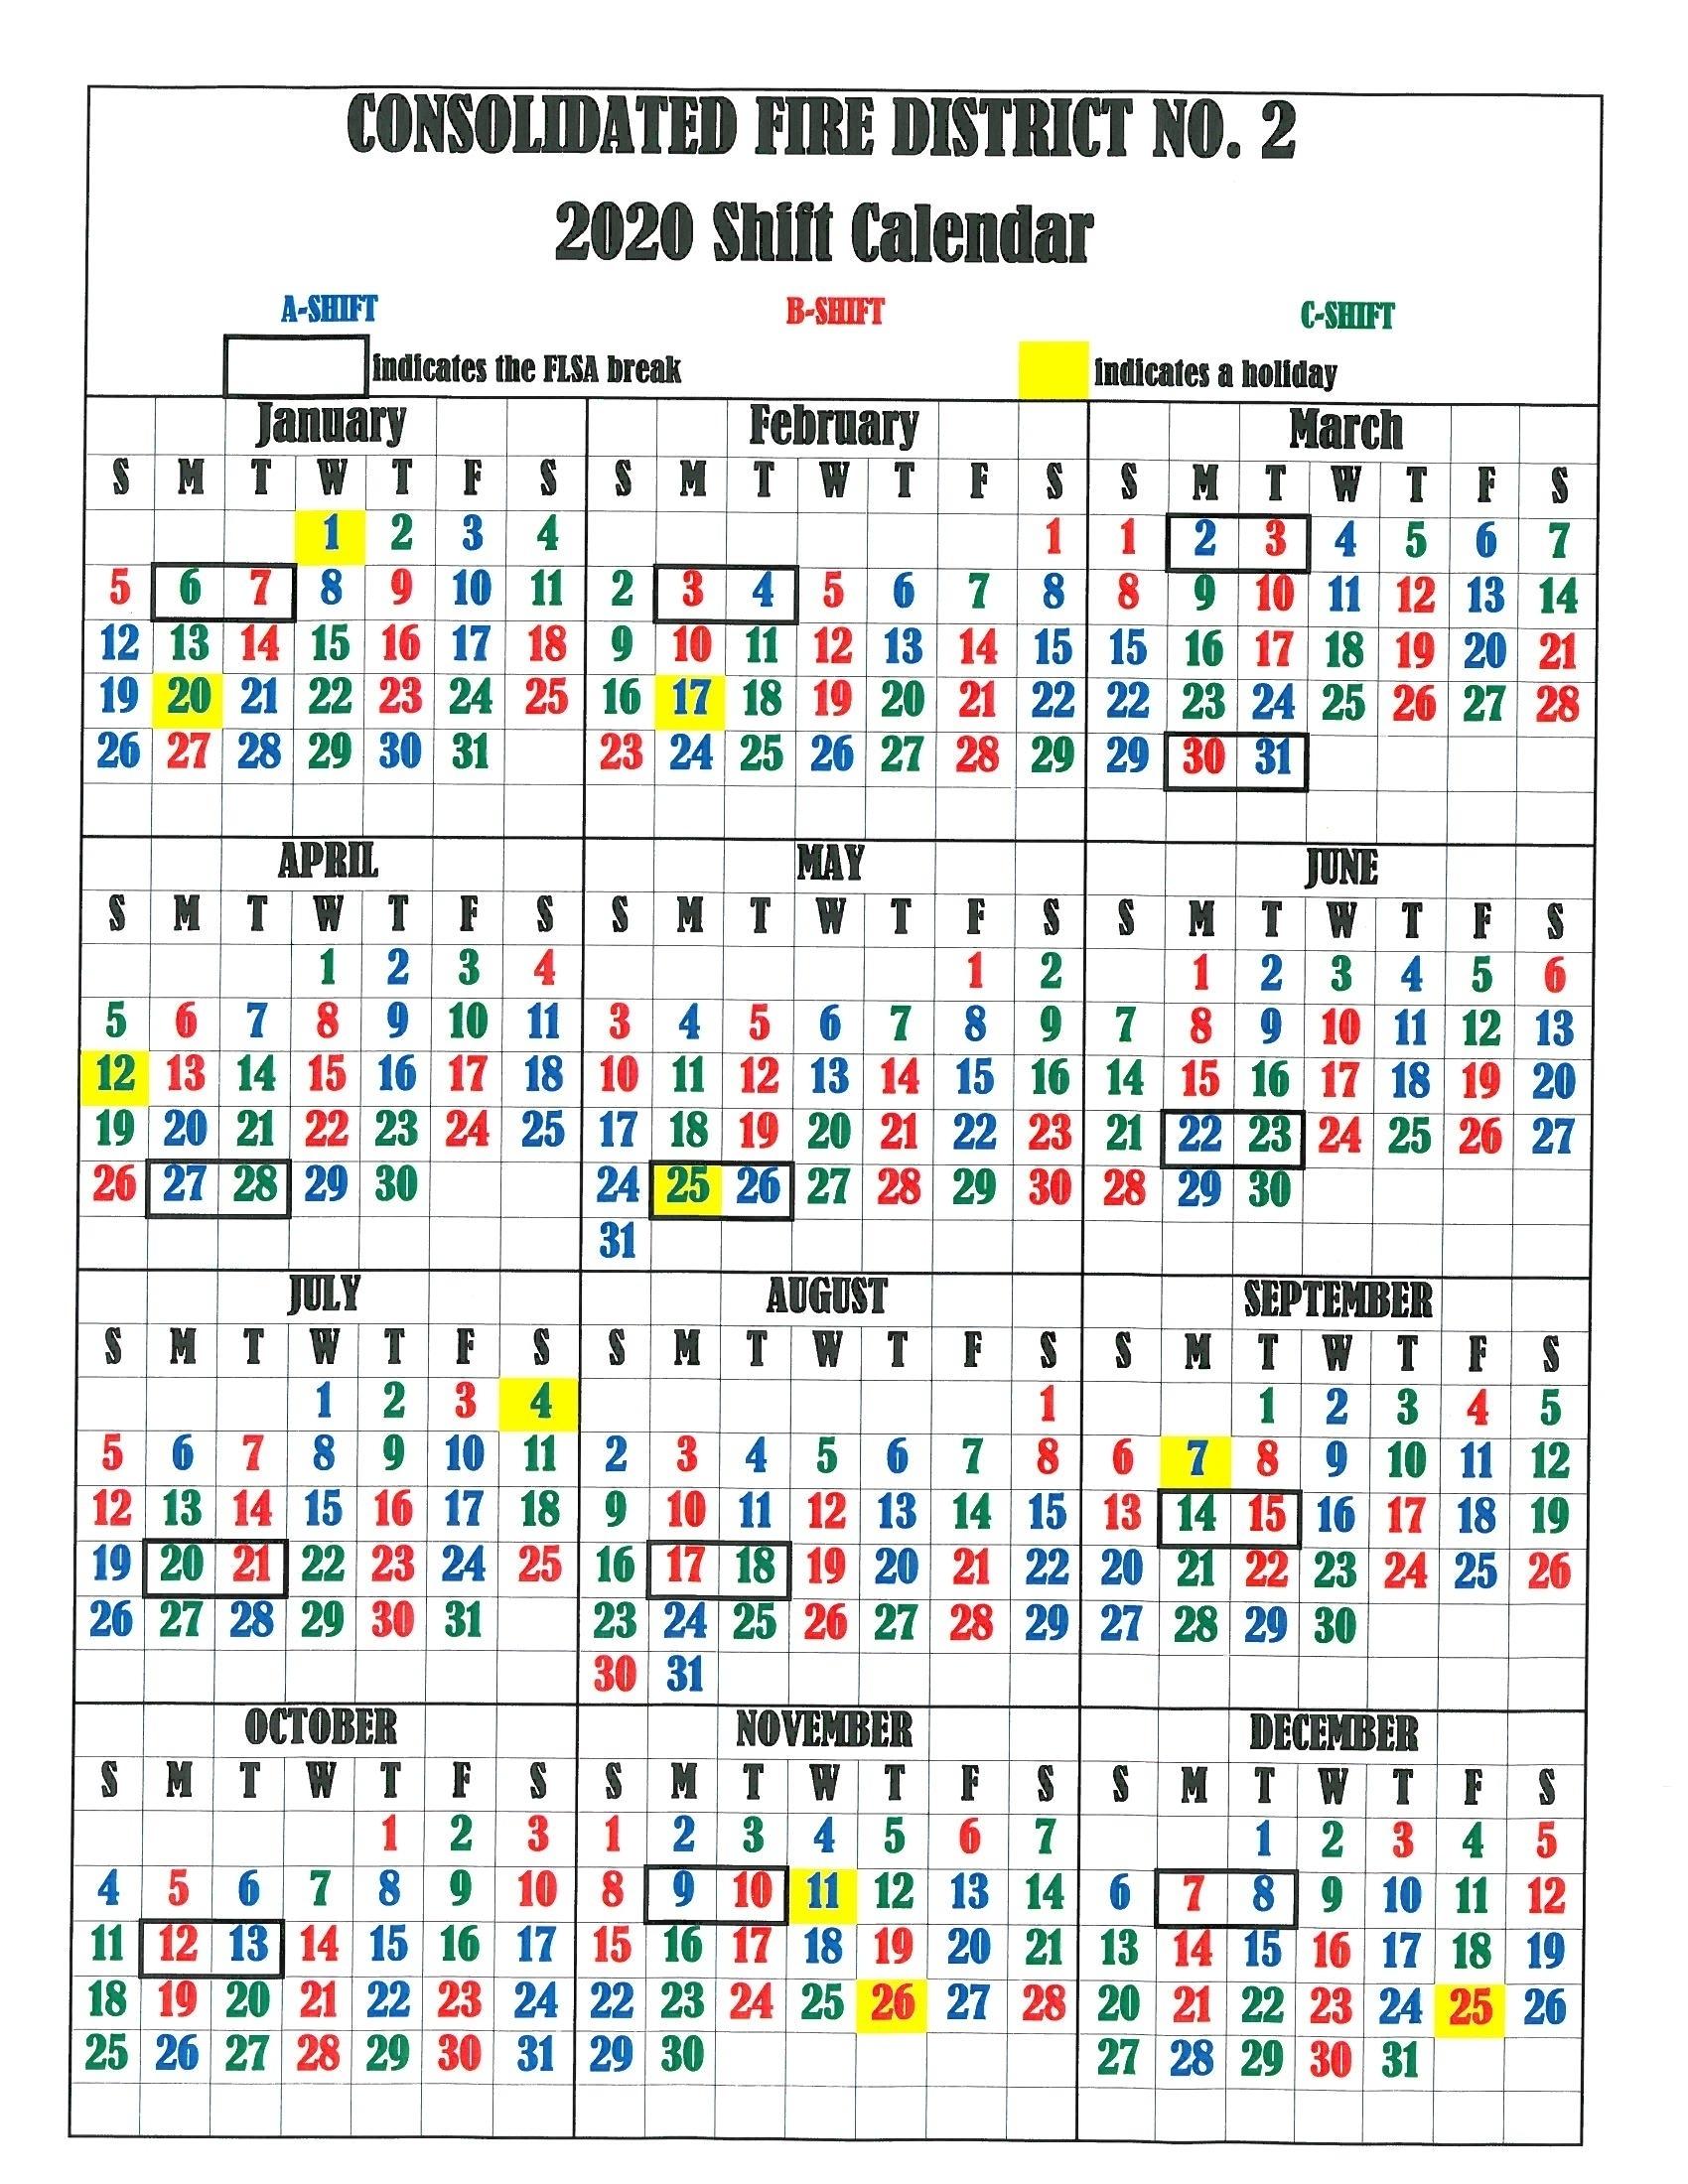 Fire Dept Shift Calendar 24/48 - Calendar Inspiration Design intended for Firefighter 24 48 Shift 2020 Calendar